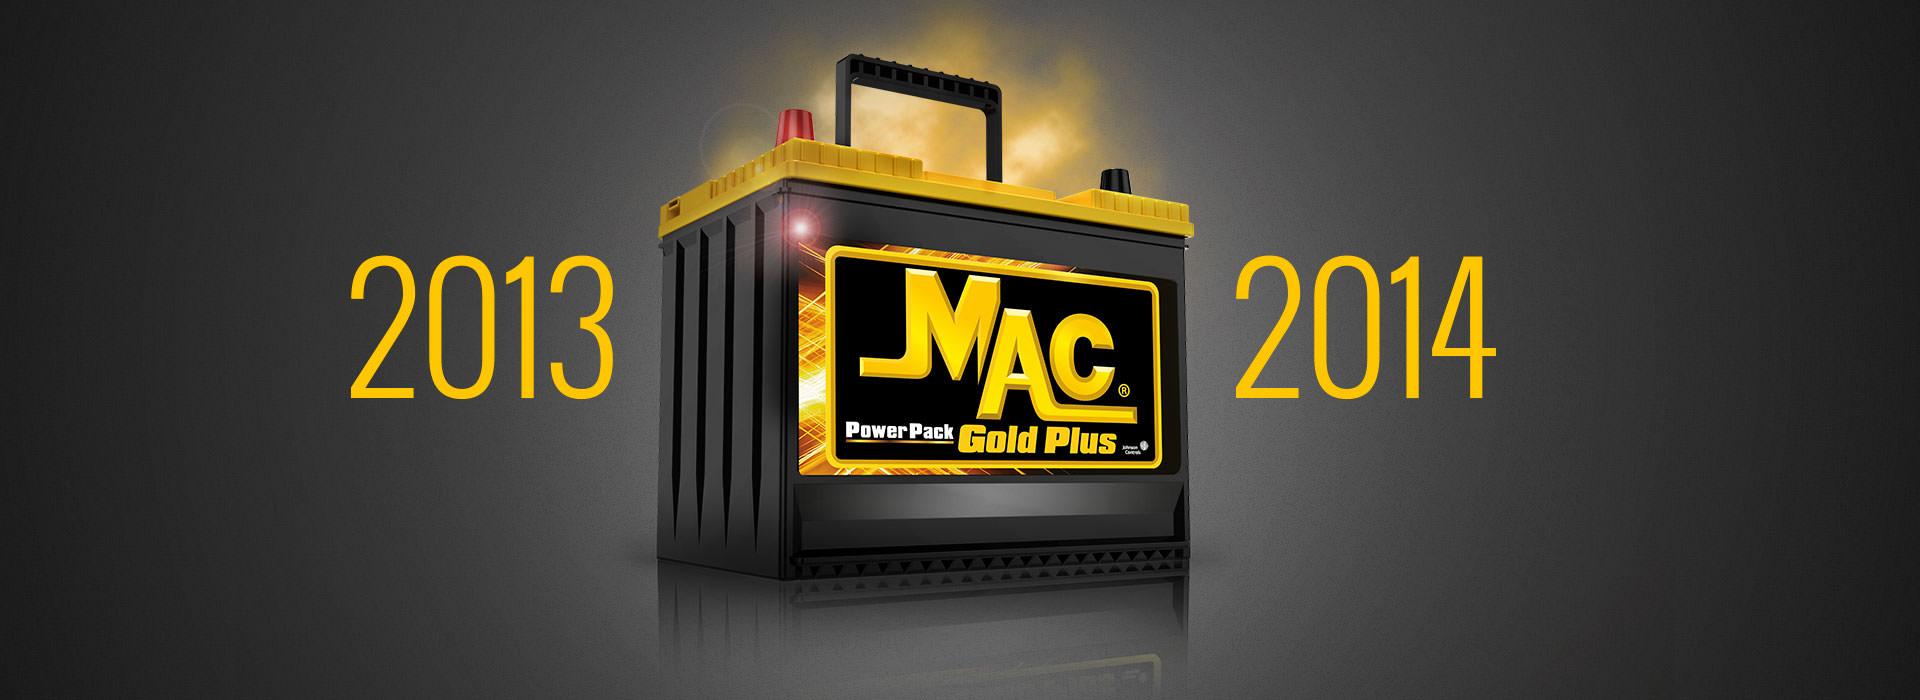 MAC_History_2013-2014.jpg